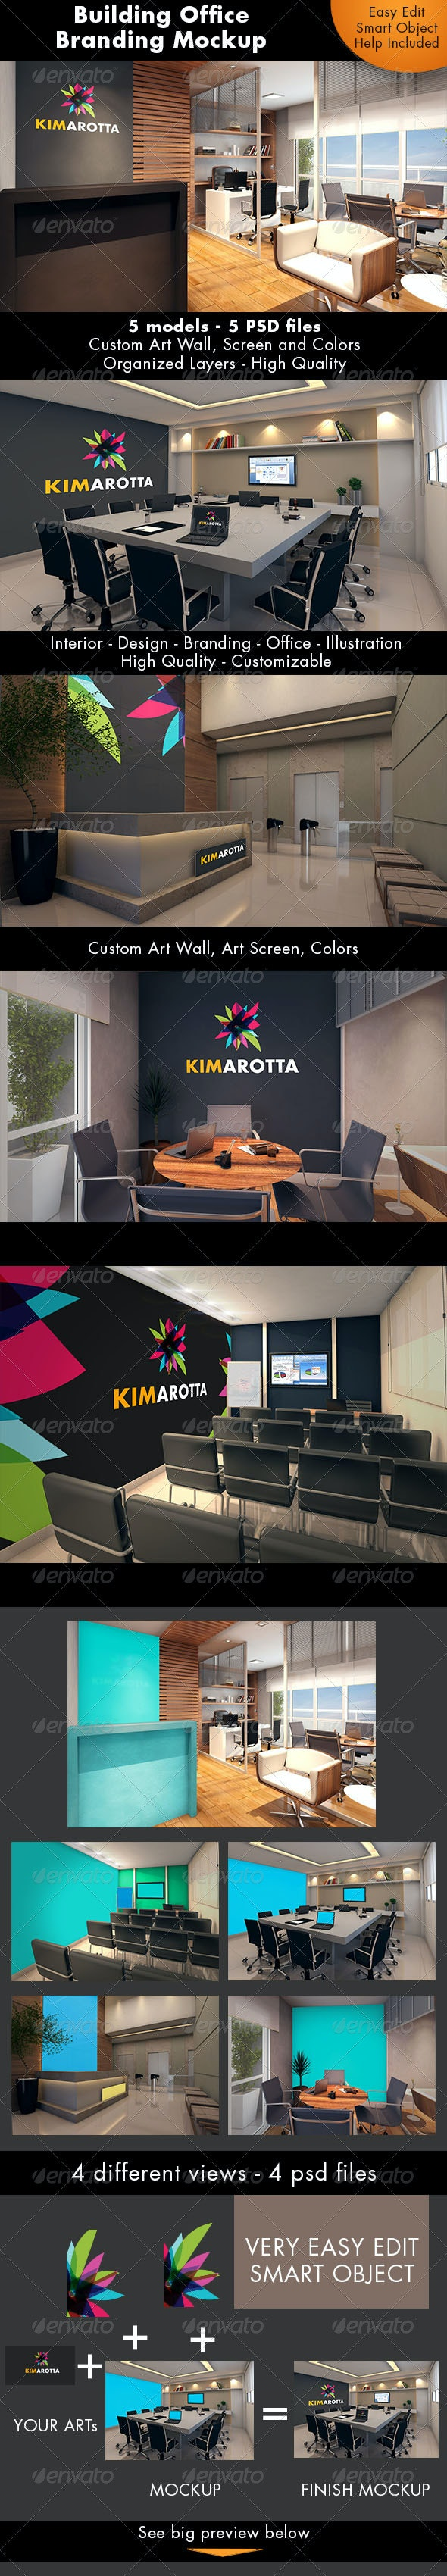 Building Office Branding Mockup - Logo Product Mock-Ups